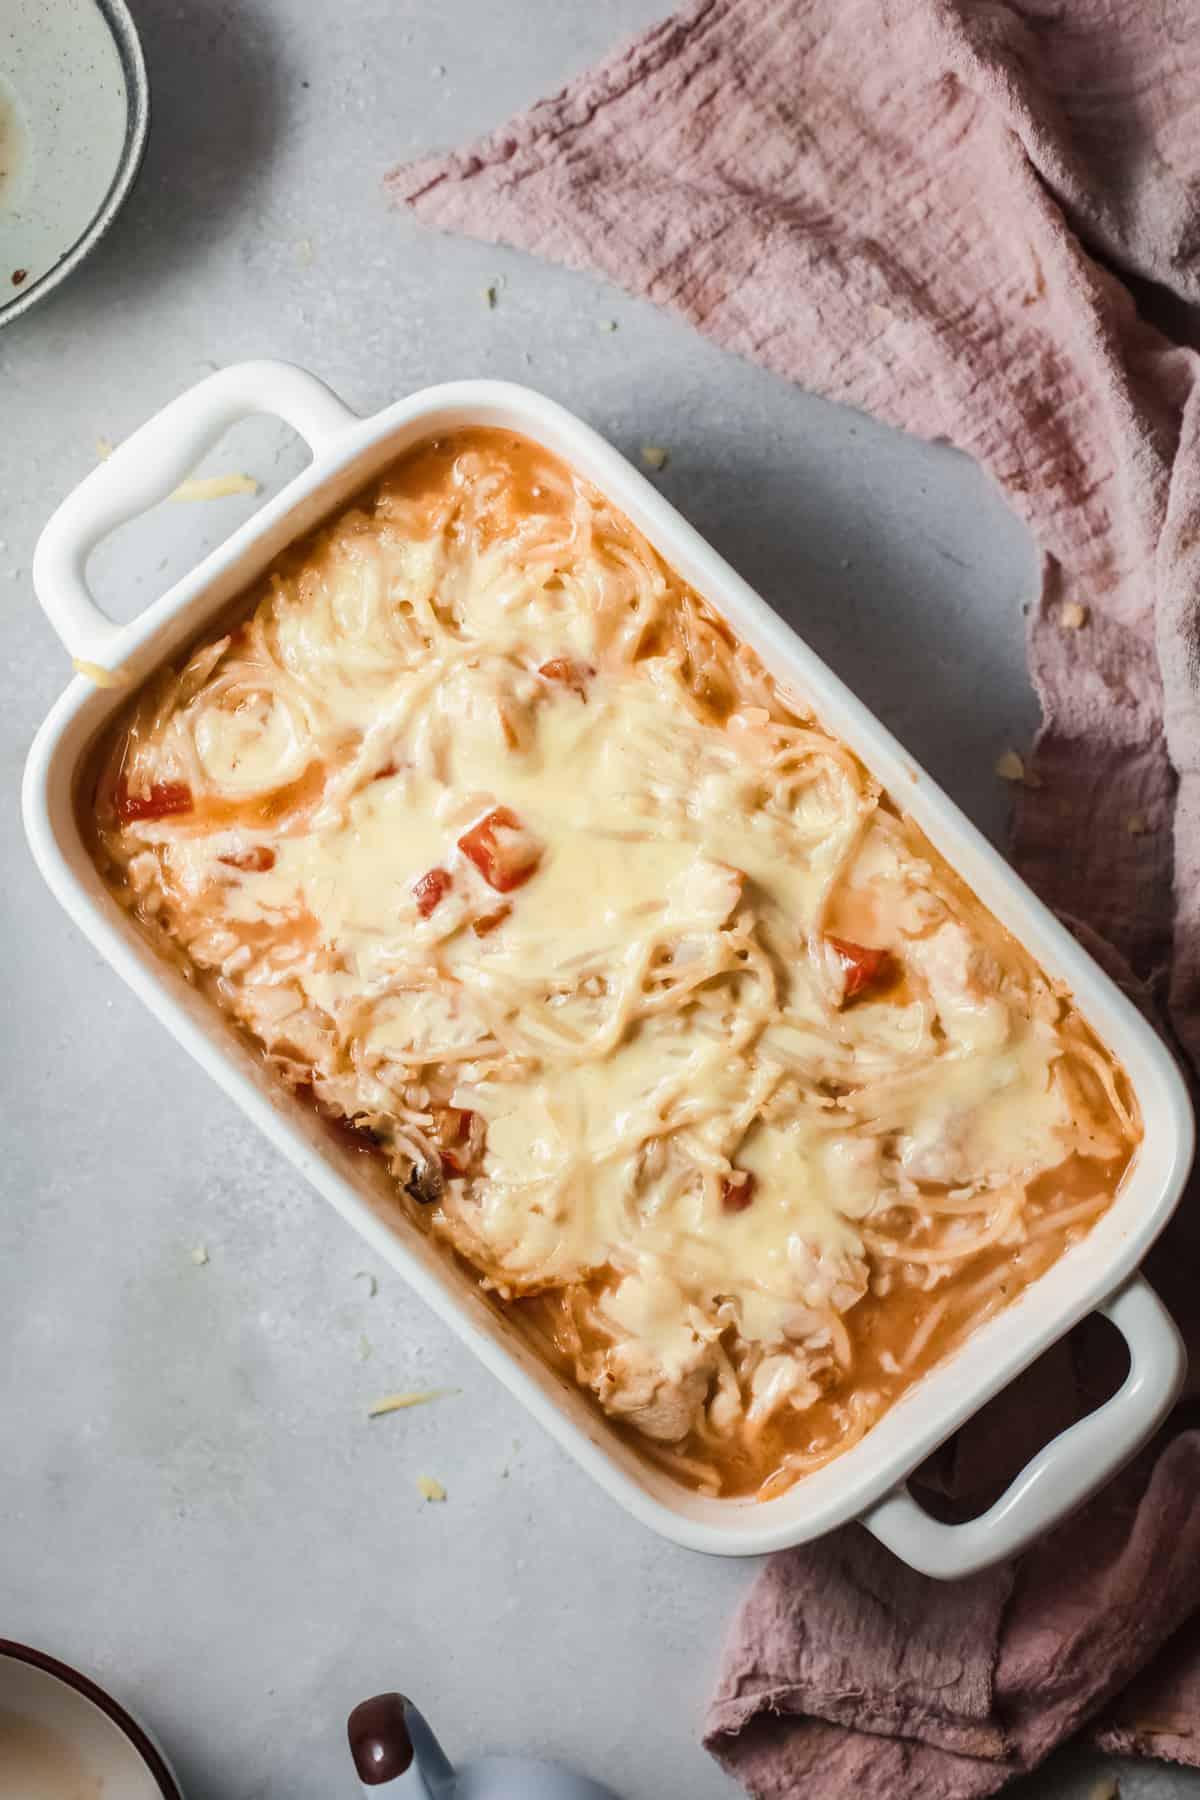 chicken Spaghetti Casserole in a white baking dish with a purple hot pad